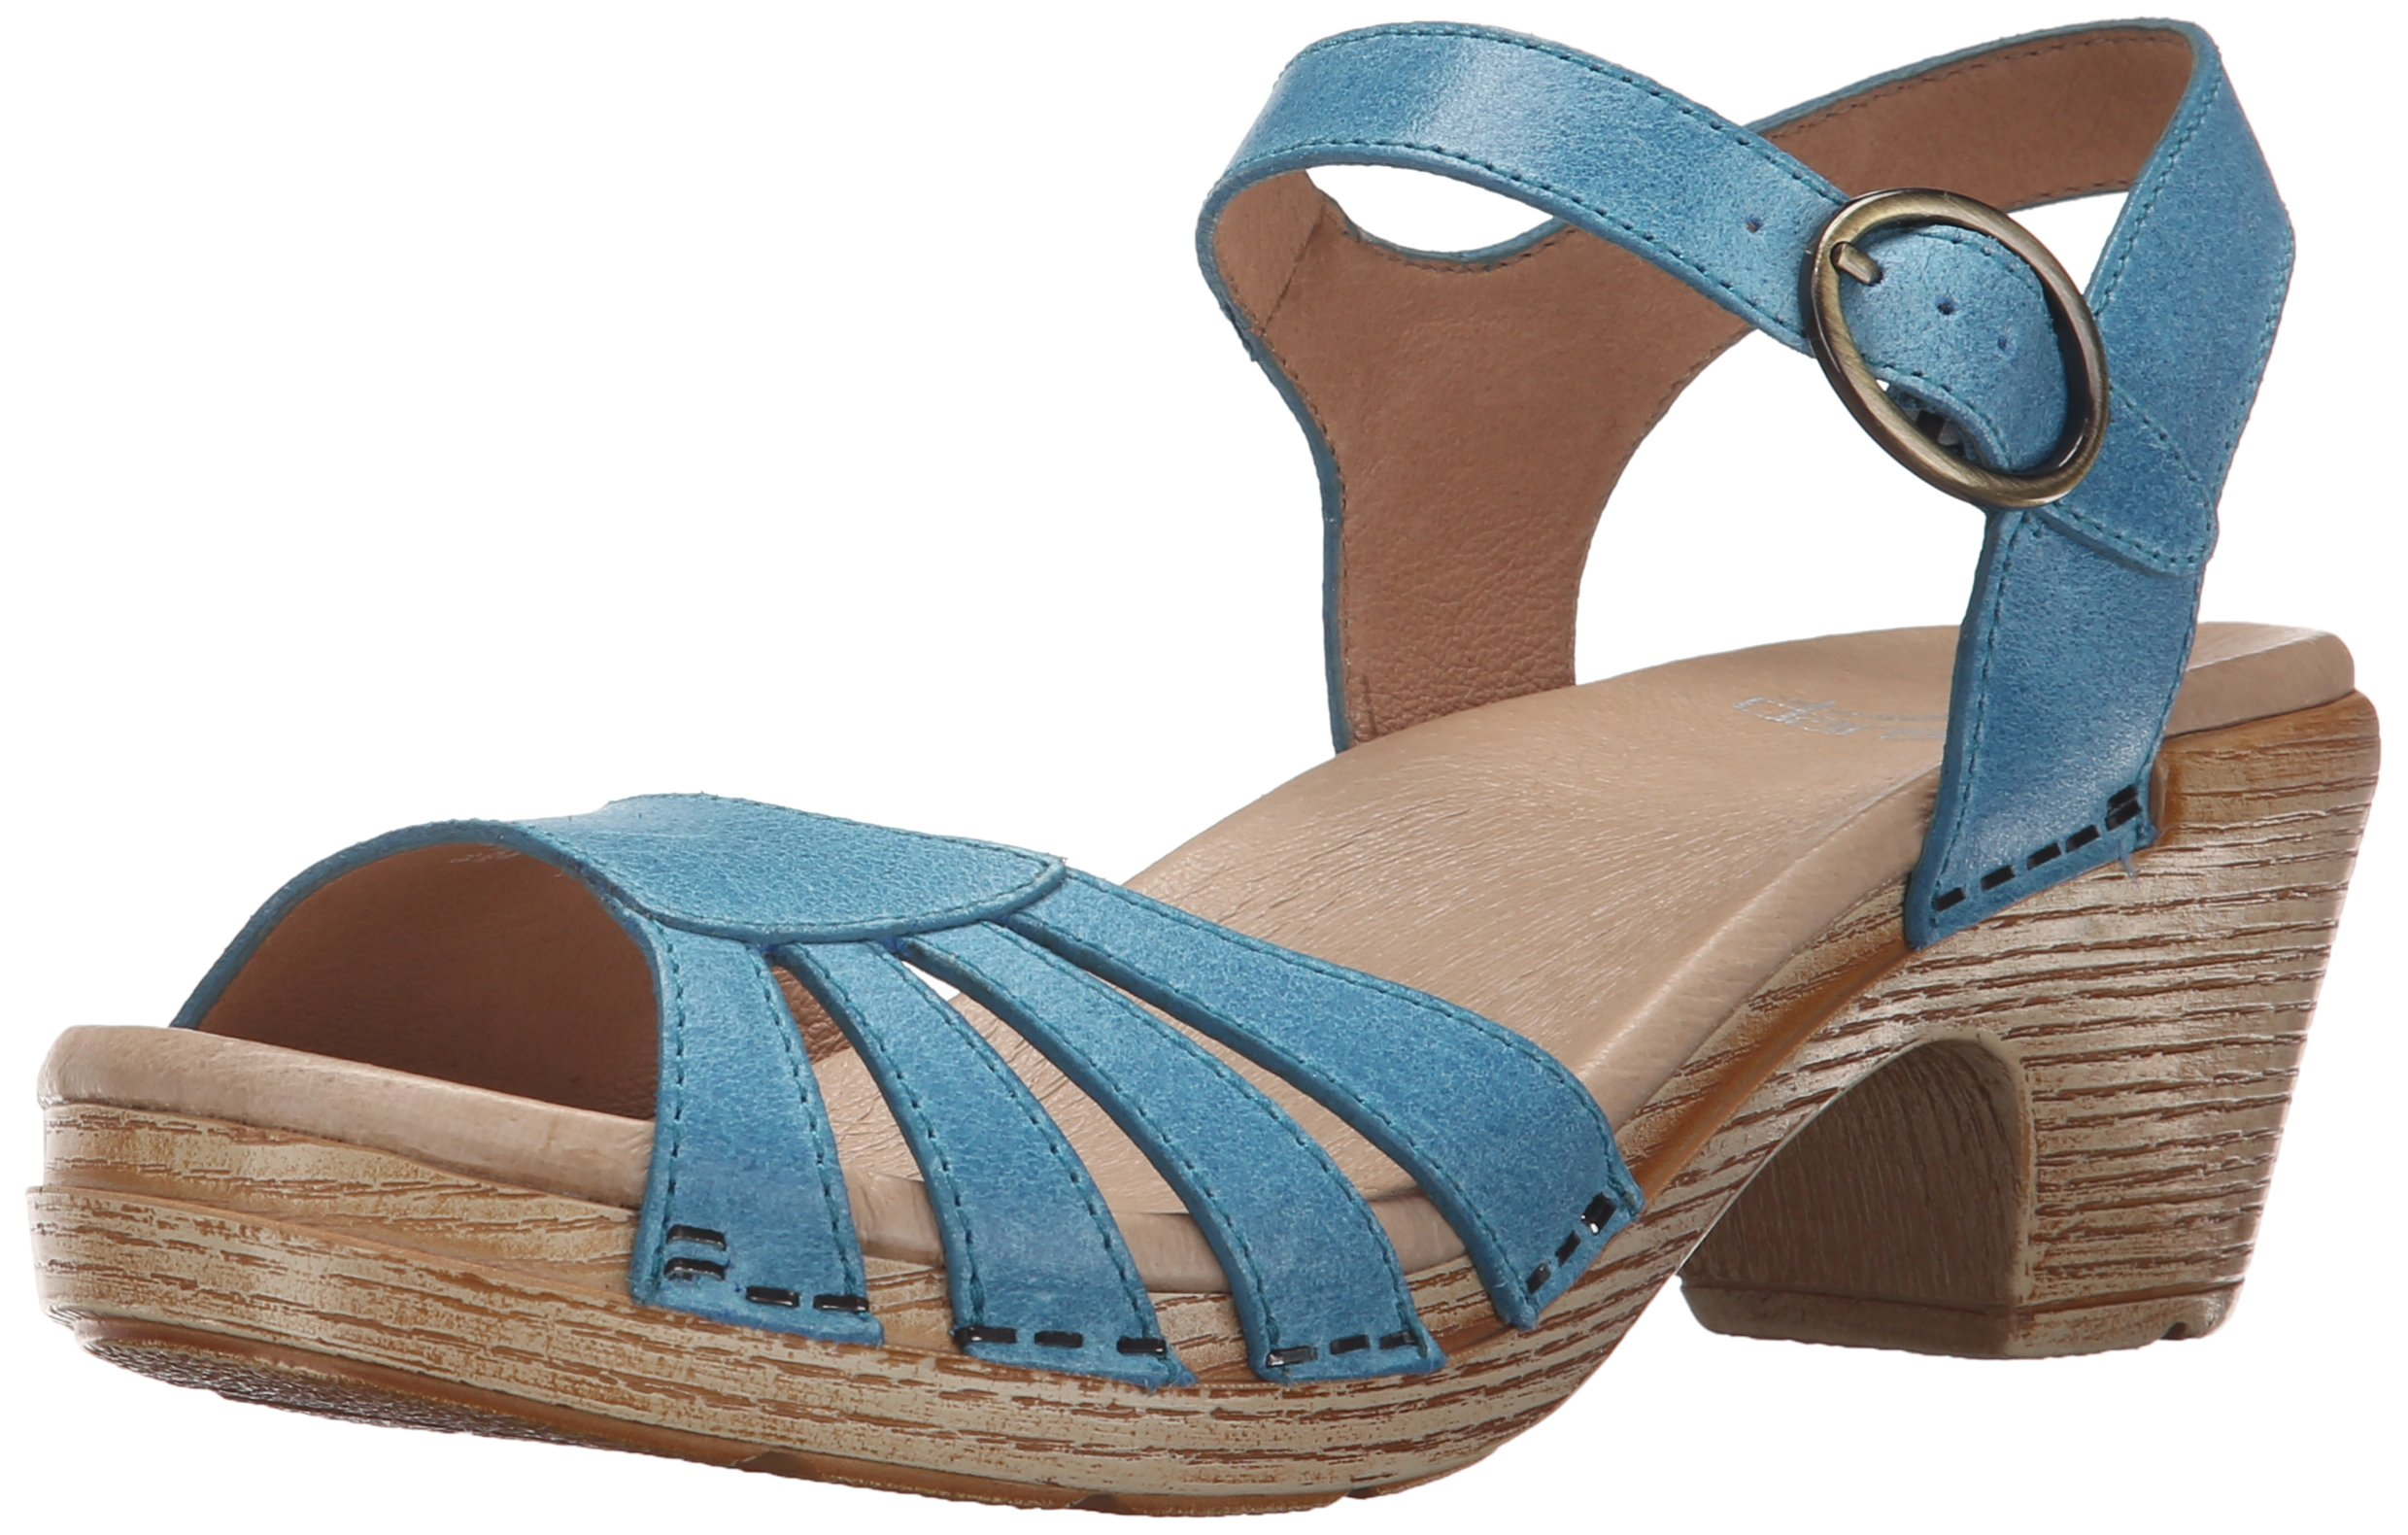 Dansko Women's Marlow Heeled Sandal, Blue Washed Leather, 39 EU/8.5-9 M US